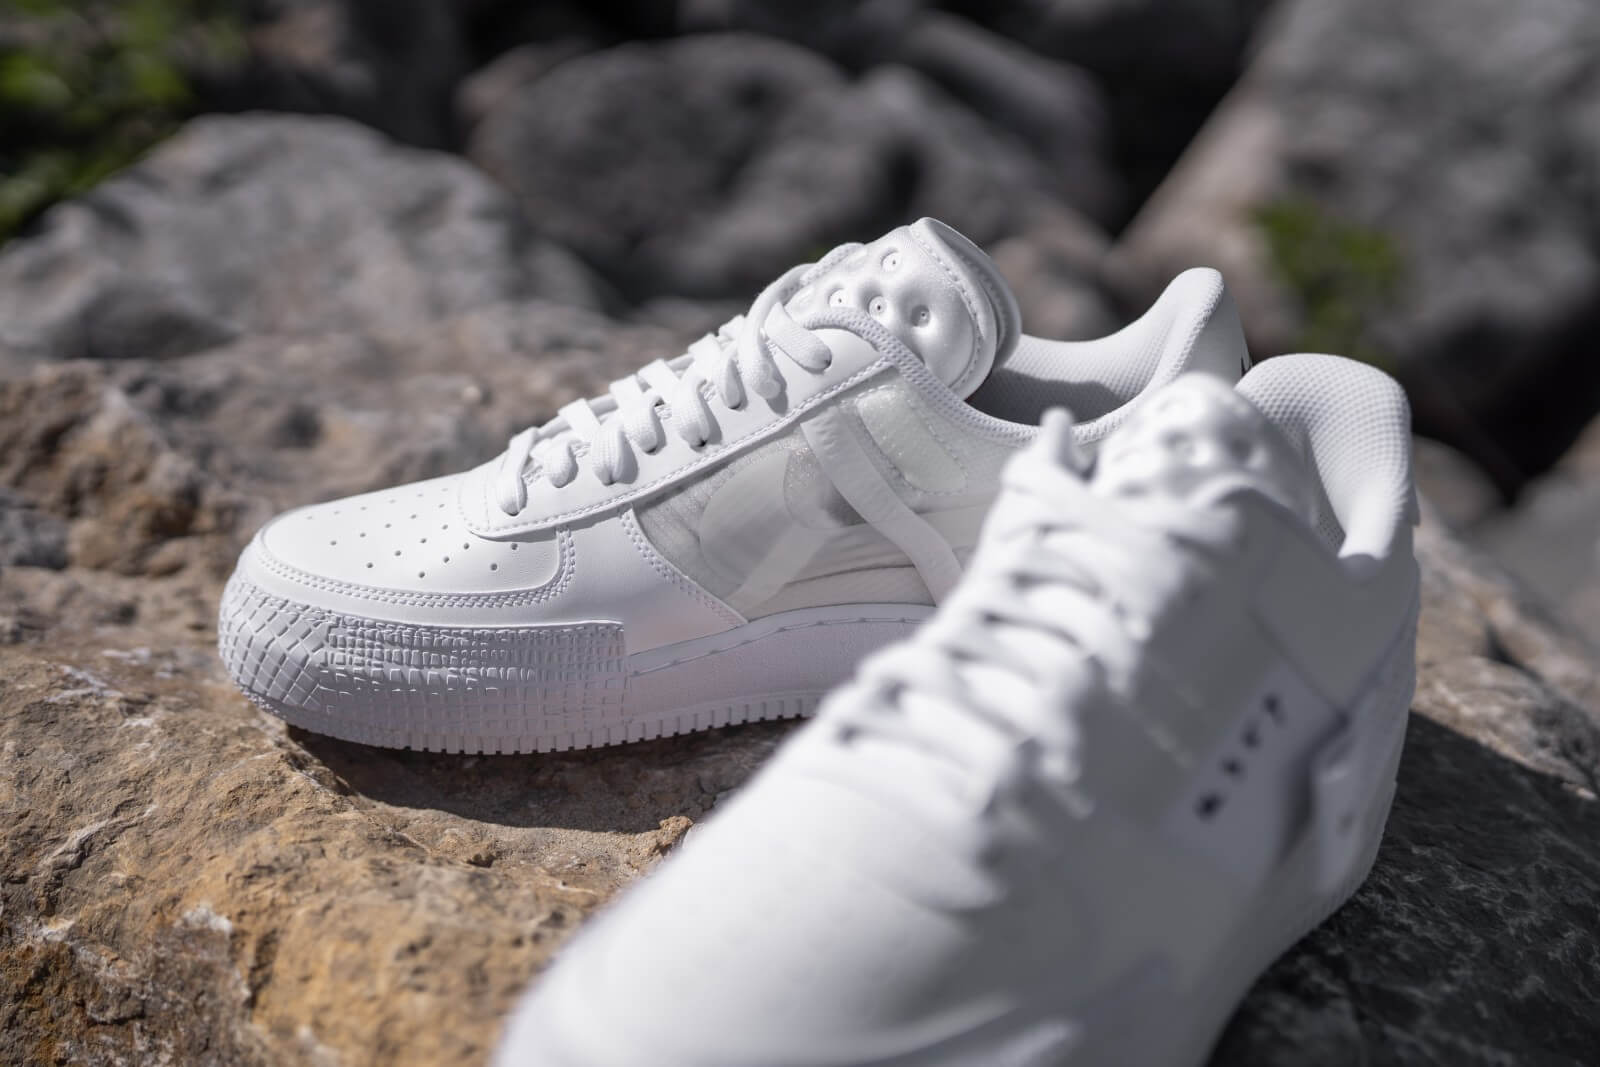 Nike Air Force 1 Type 2 White/Black